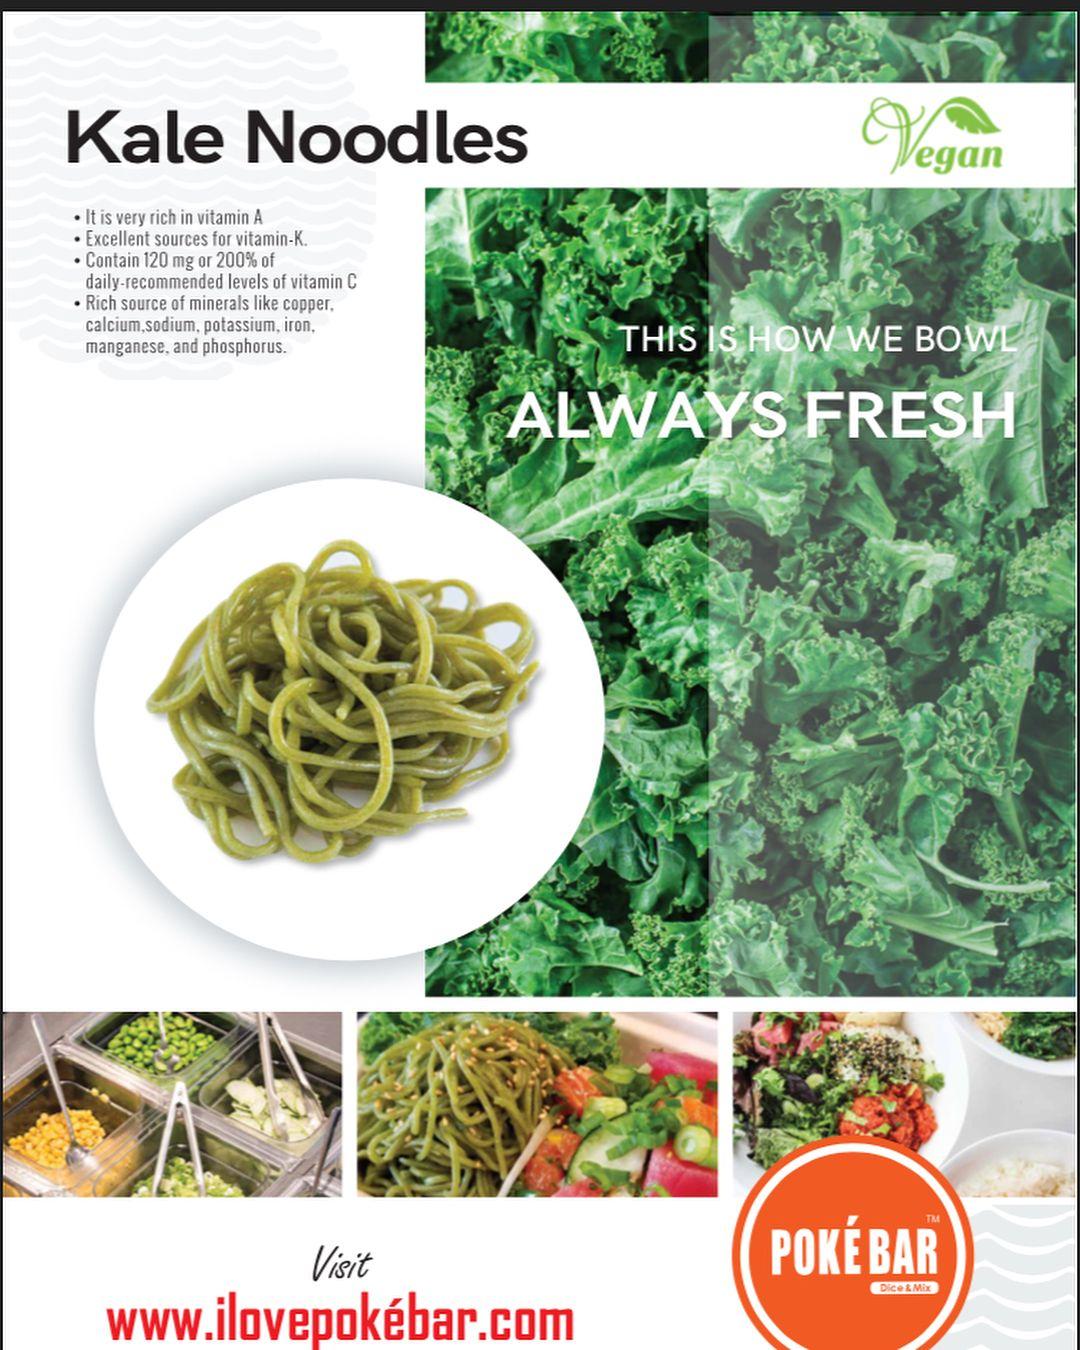 Poke Bar On Instagram Our Vegan Friendly Kale Noodles Are Rich